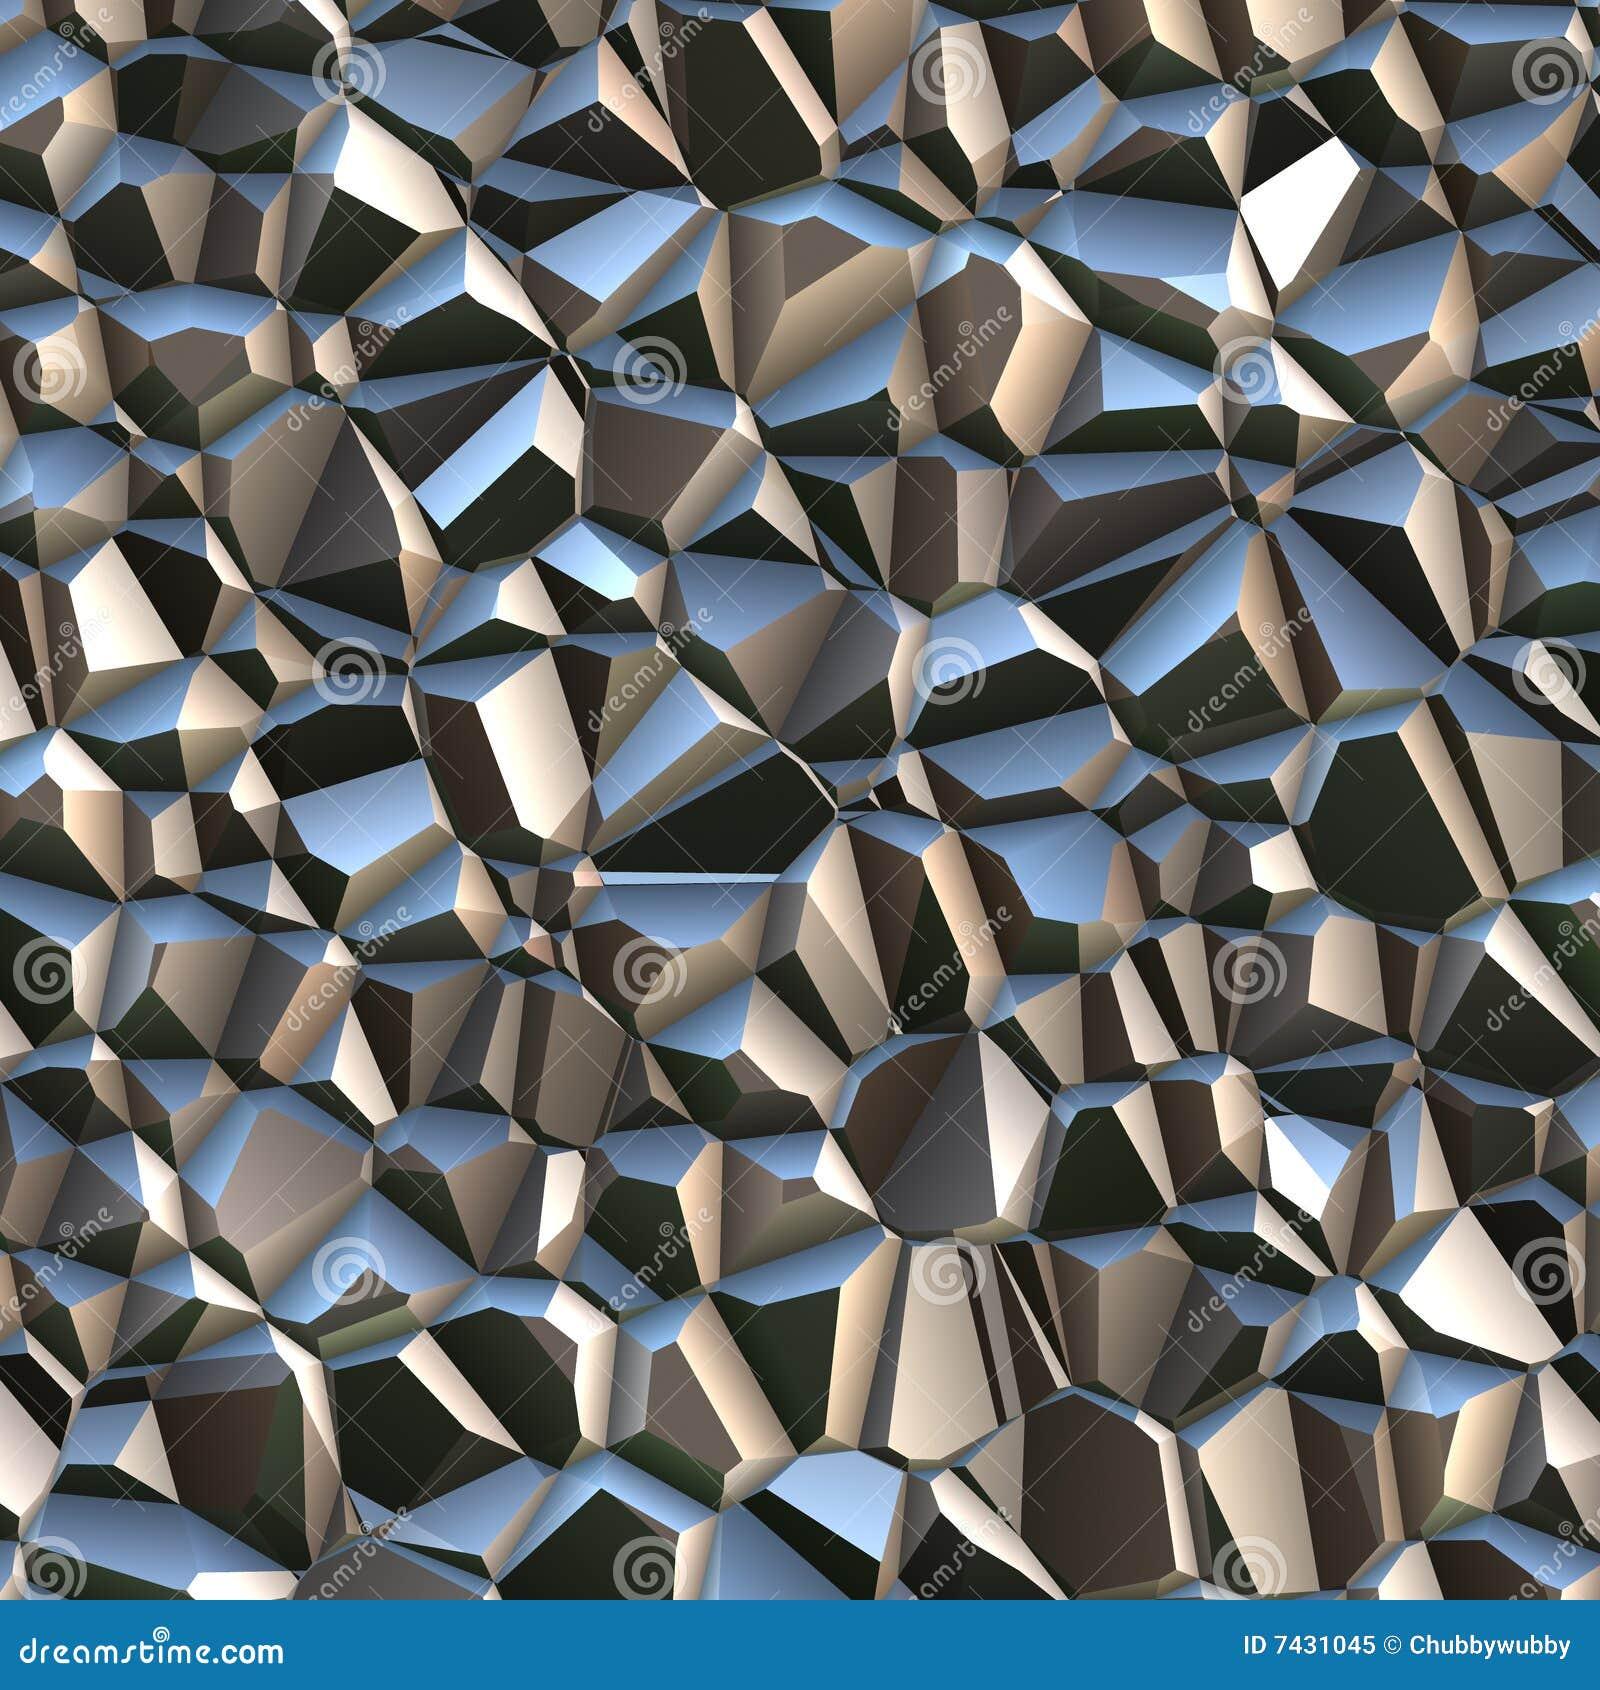 Sci fi design stock illustration illustration of seamless for Sci fi decor